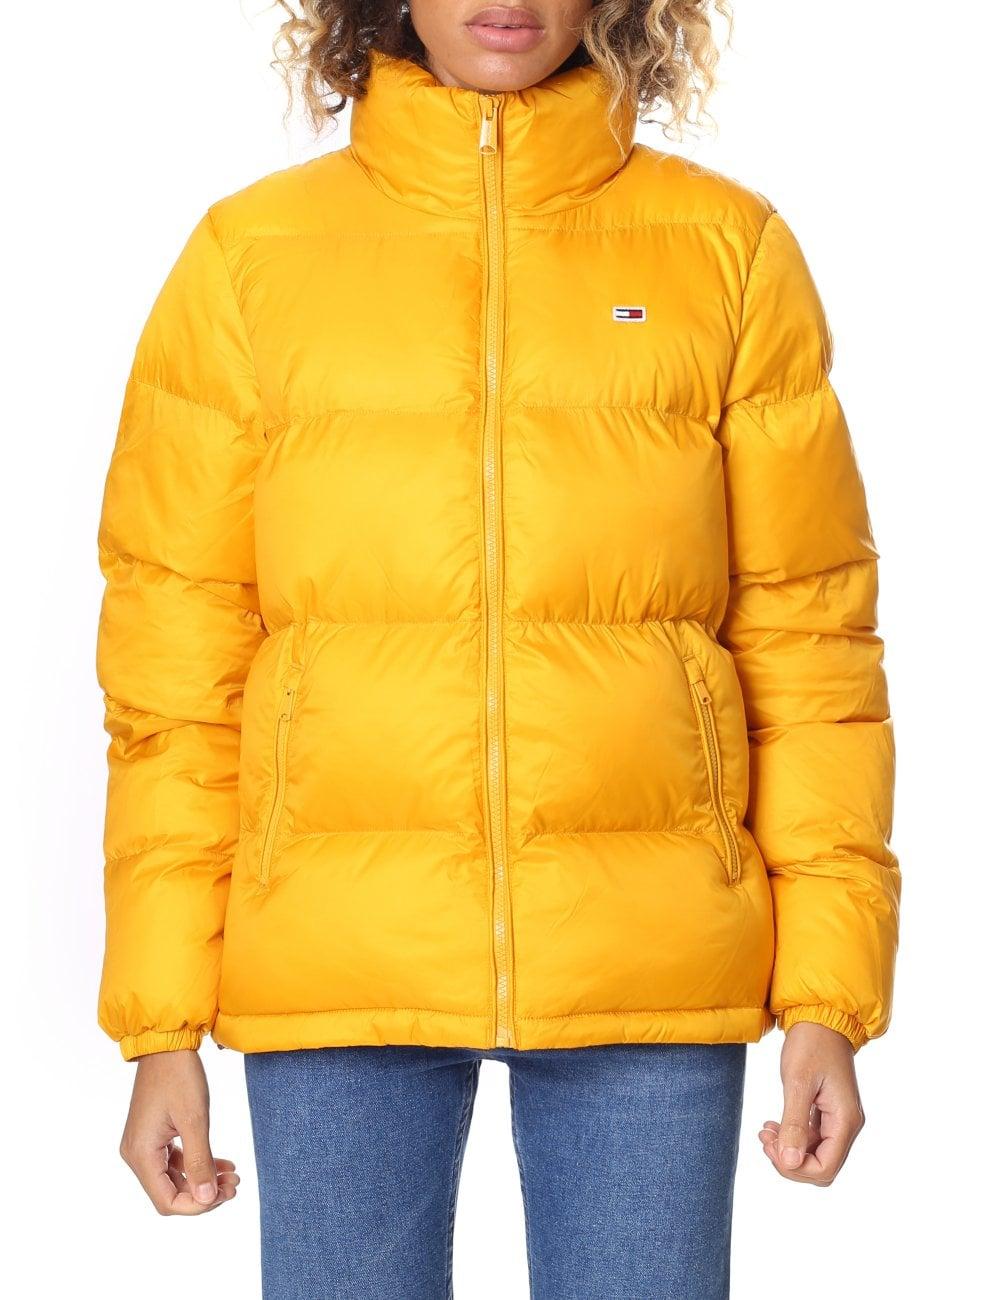 Tommy Hilfiger Women S Tommy Classic Puffa Jacket